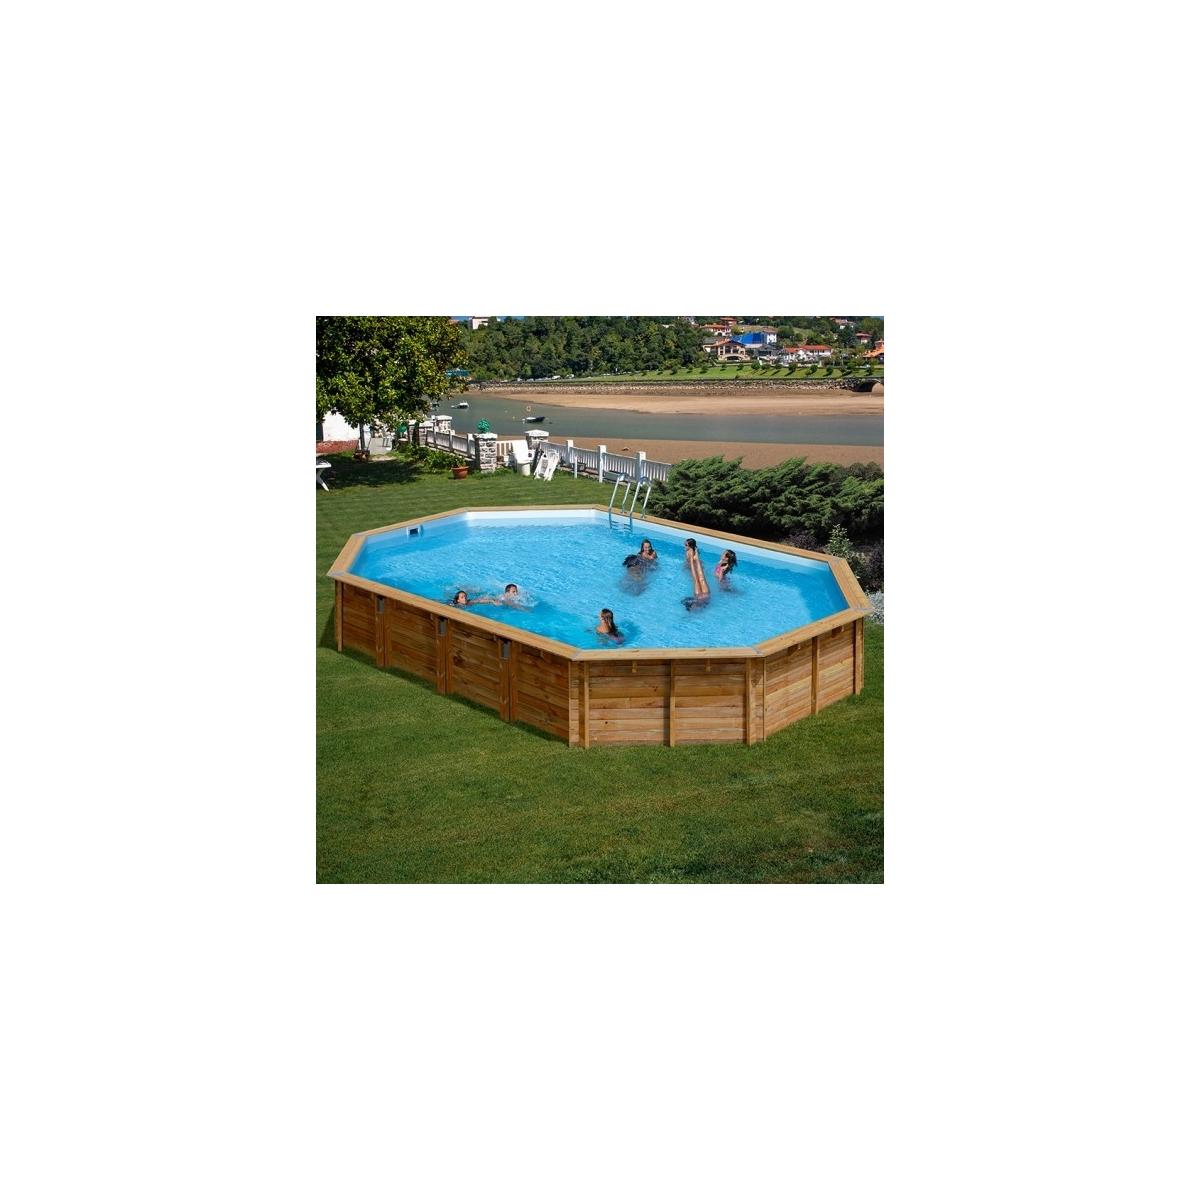 Piscina desmontable de madera Gre Sunbay Avila ovalada 923x576x146